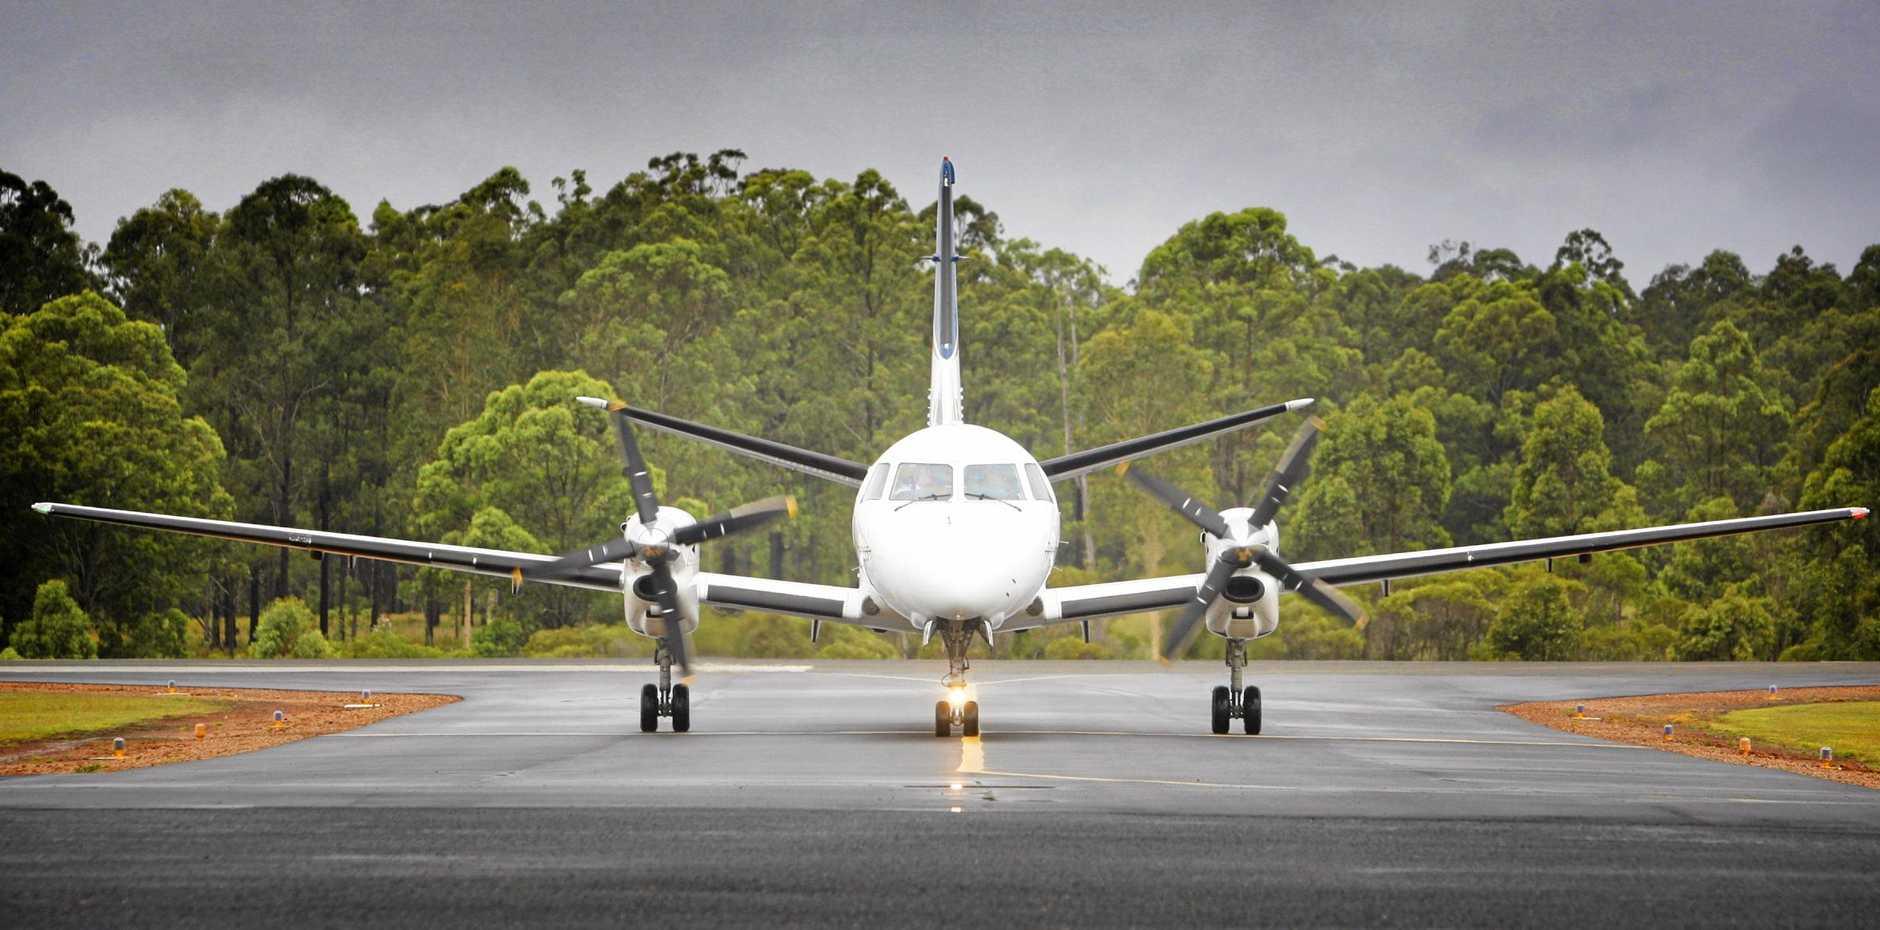 A lightbulb malfunction caused a NSW Air Ambulance aeroplane to trigger an air alarm.